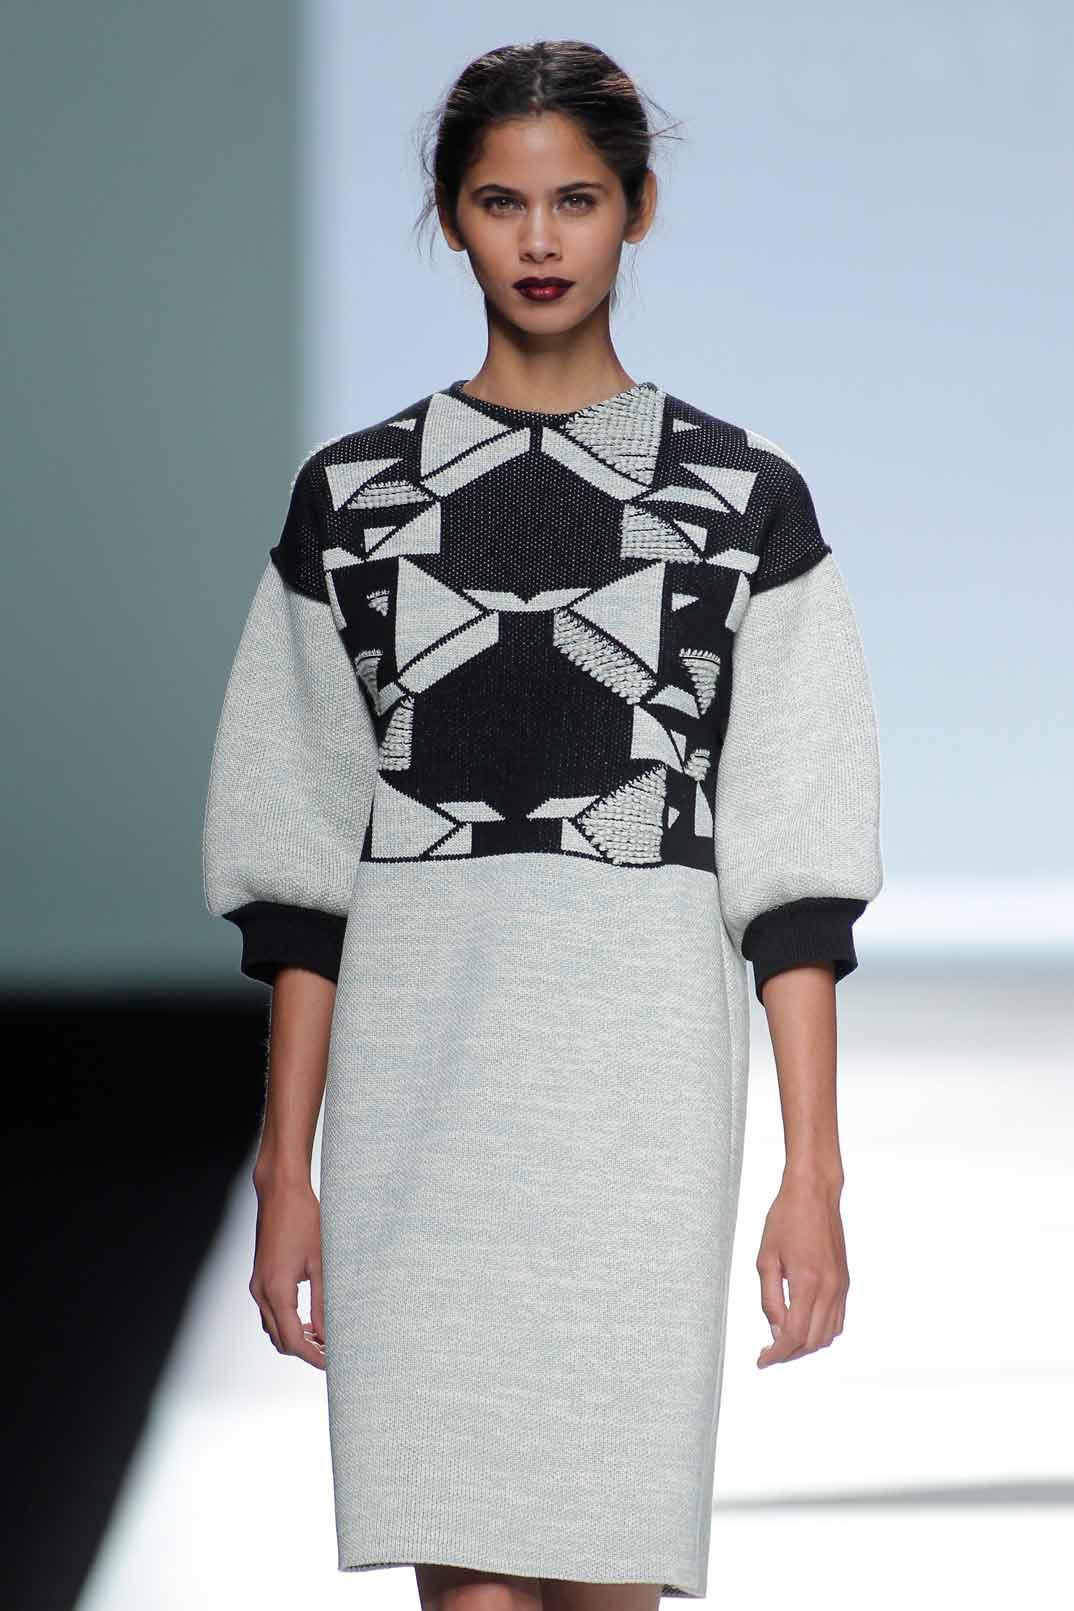 Mercedes Benz Modesto >> Madrid Fashion Week 2016: Debota Y Lomba - magazinespain.com